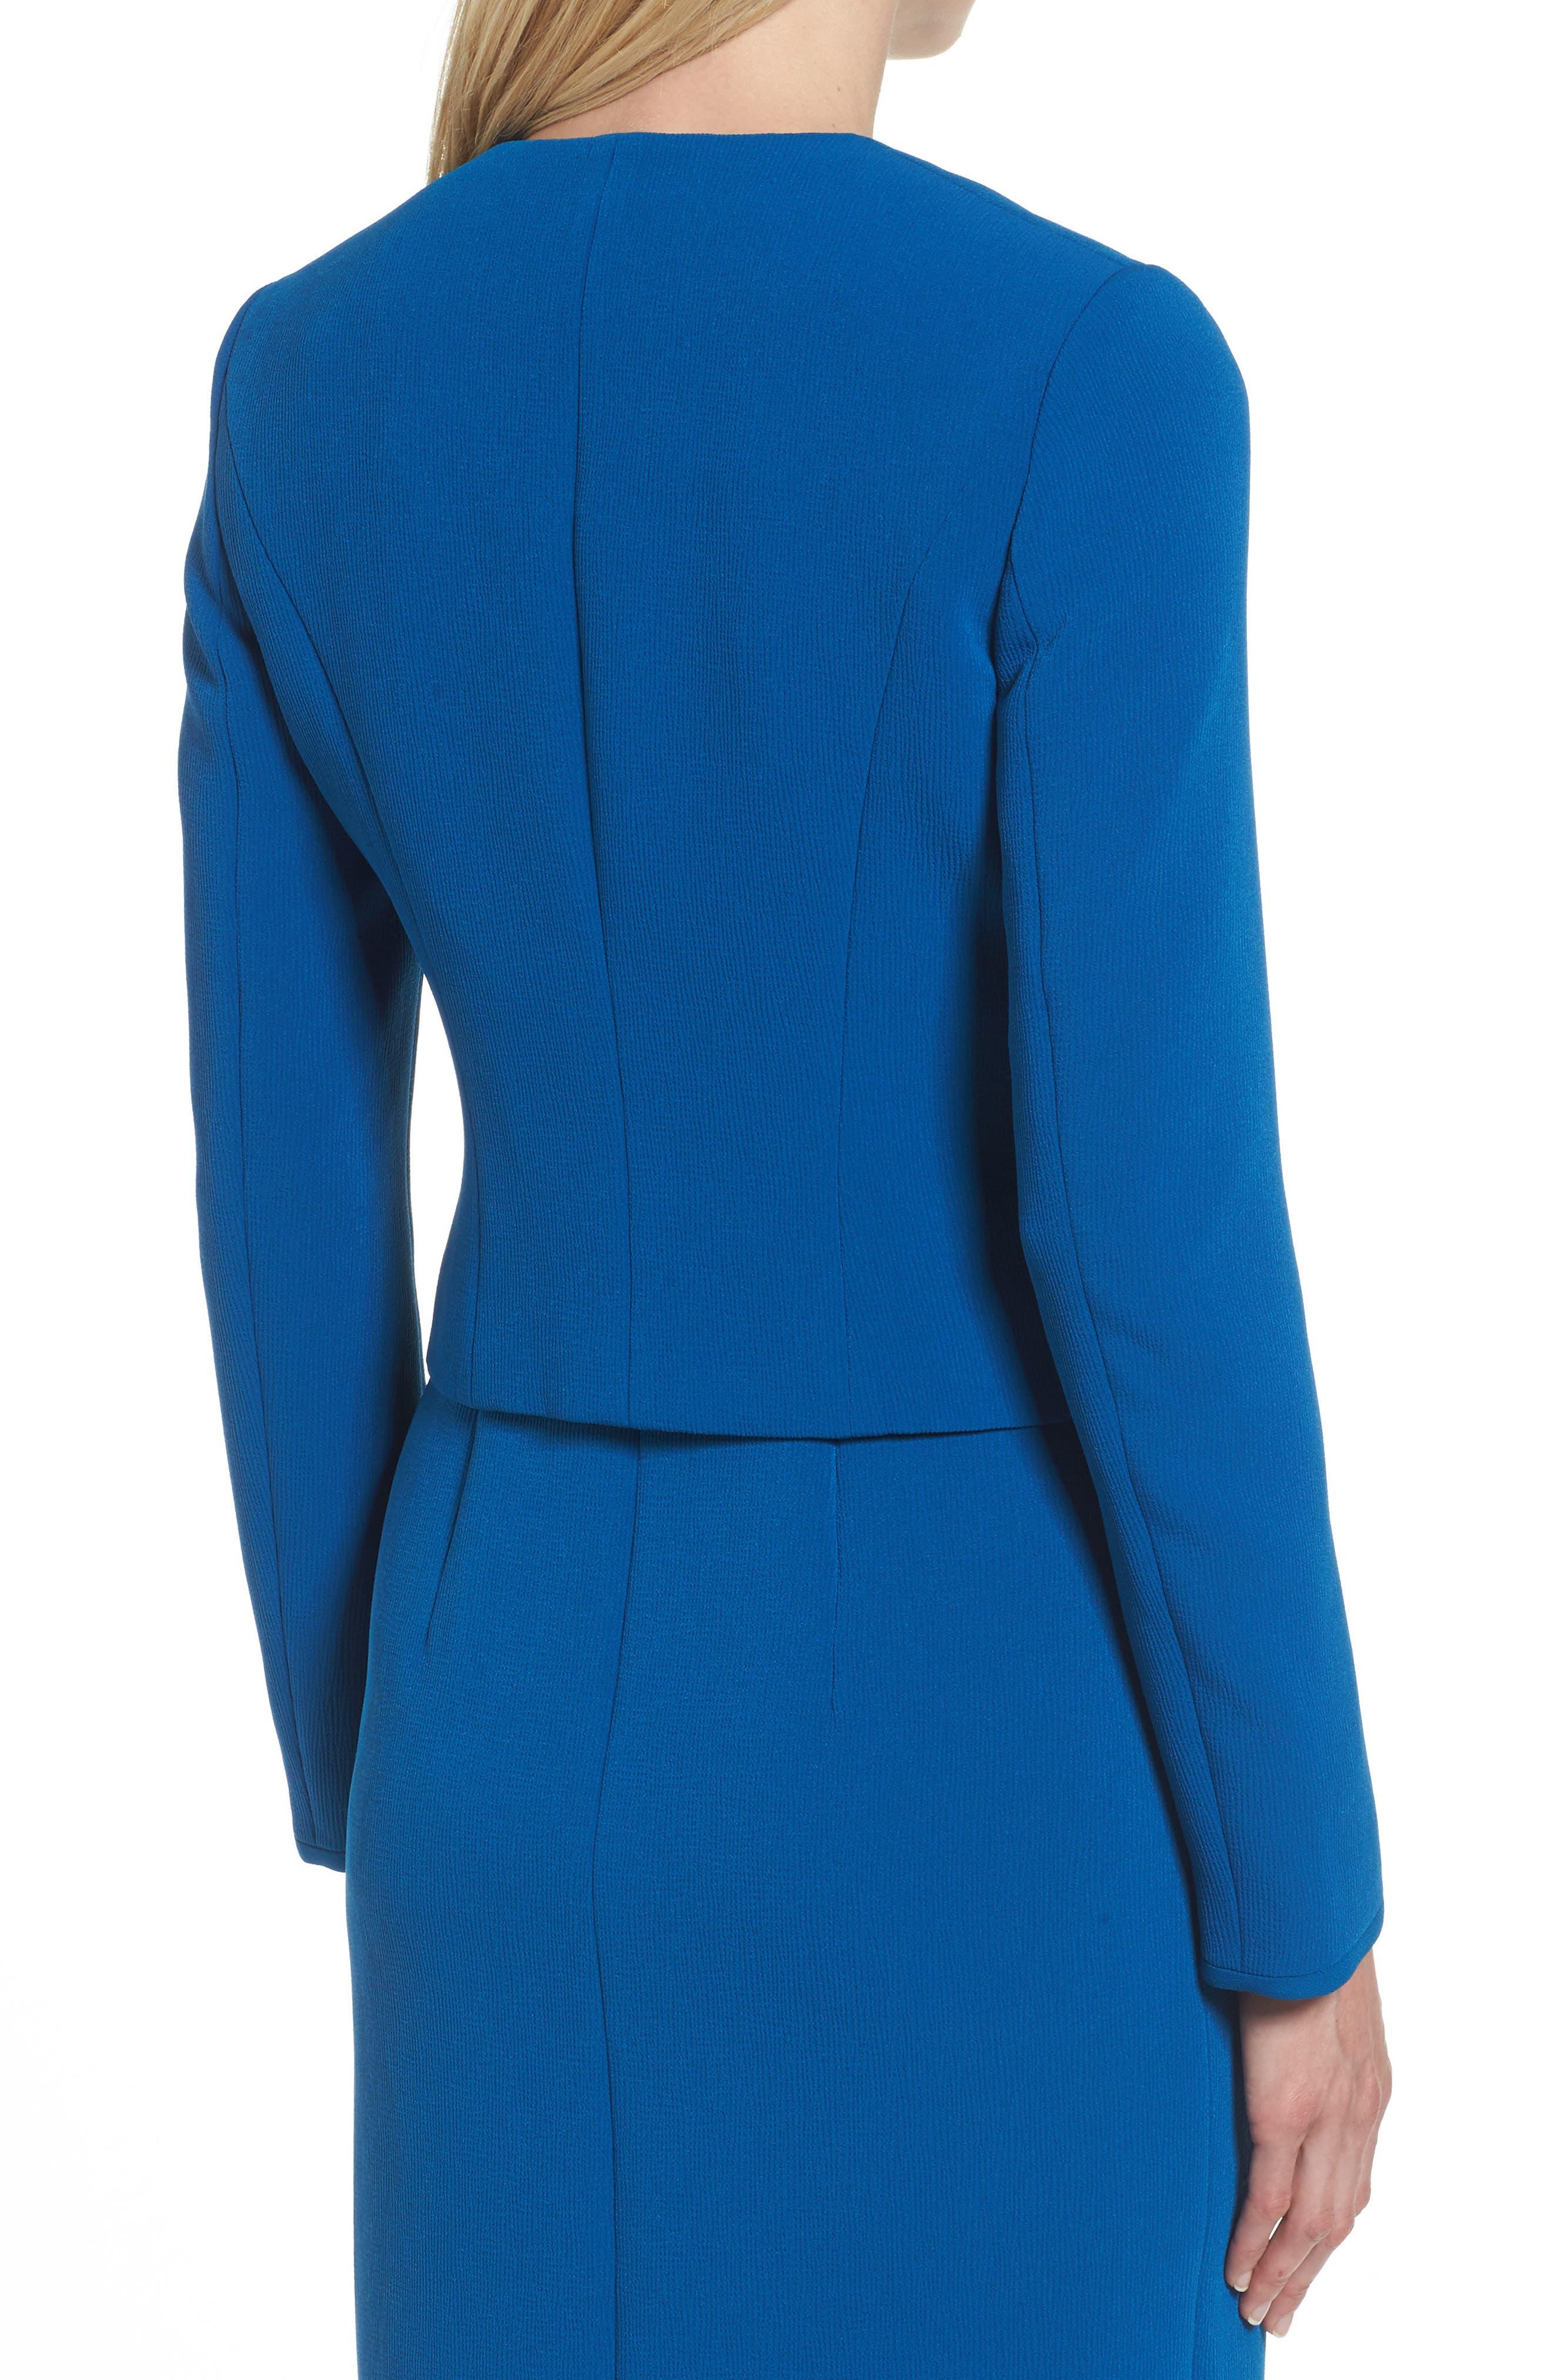 Alternate Image 2  - BOSS Jerusa Crop Suit Jacket (Petite) (Nordstrom Exclusive)